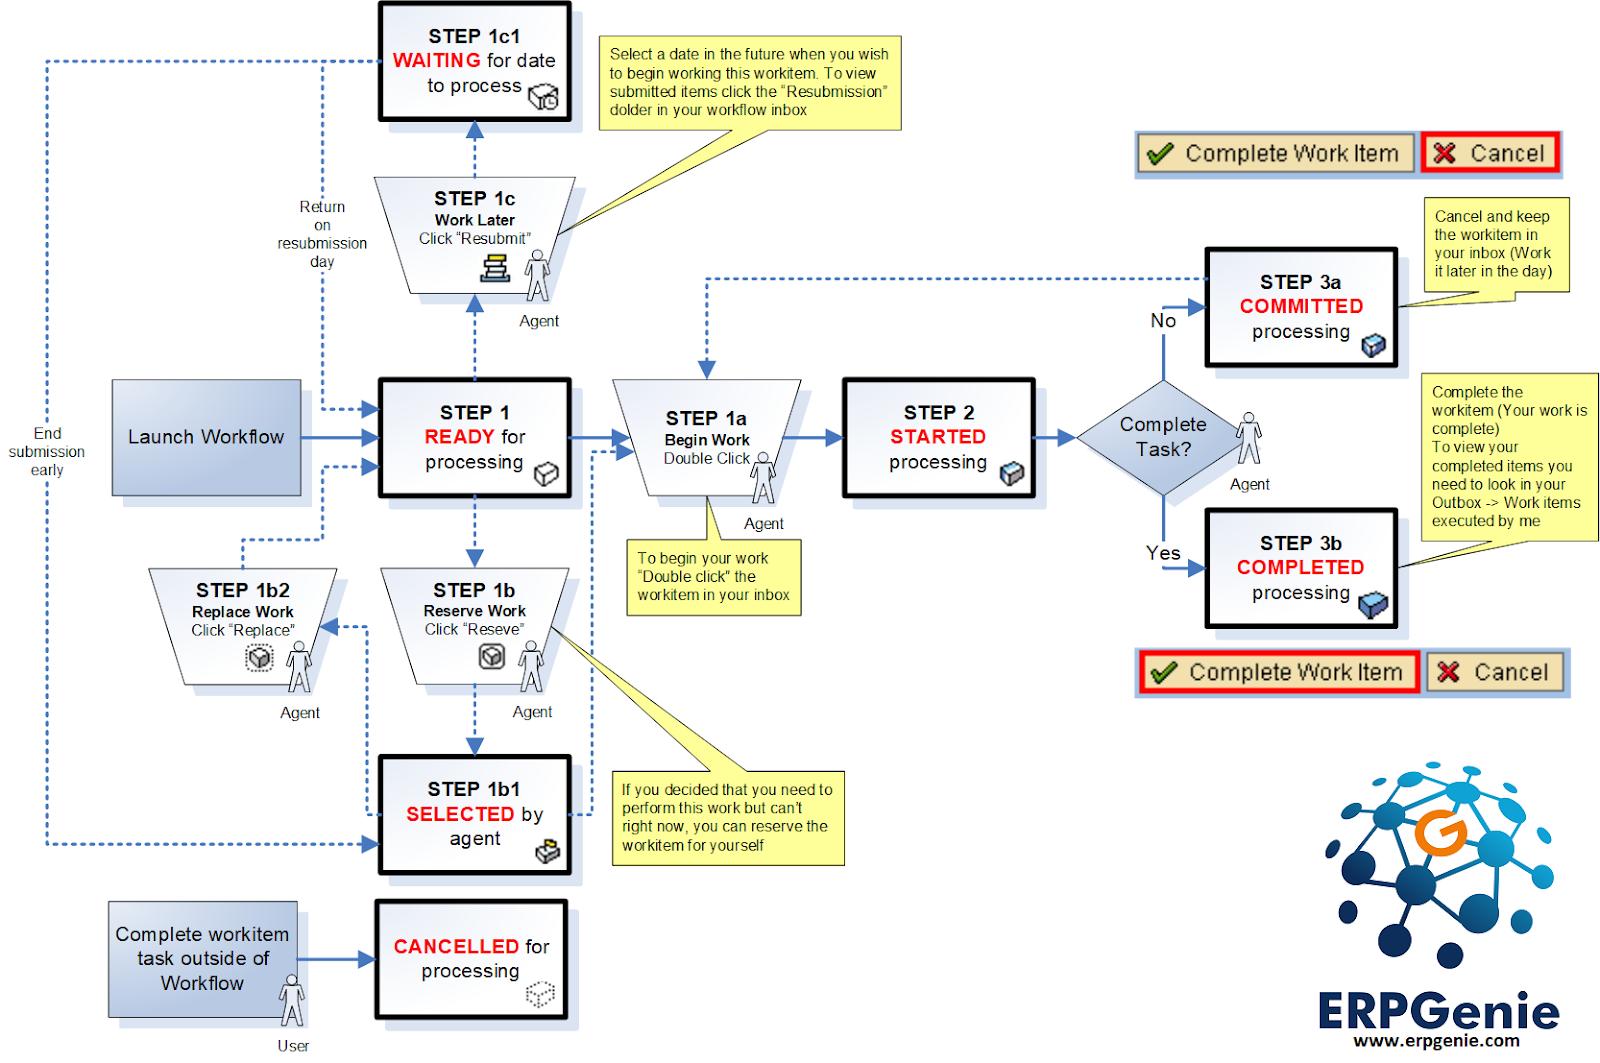 Erpgenie sap workflow workitem status cheatsheet ccuart Image collections